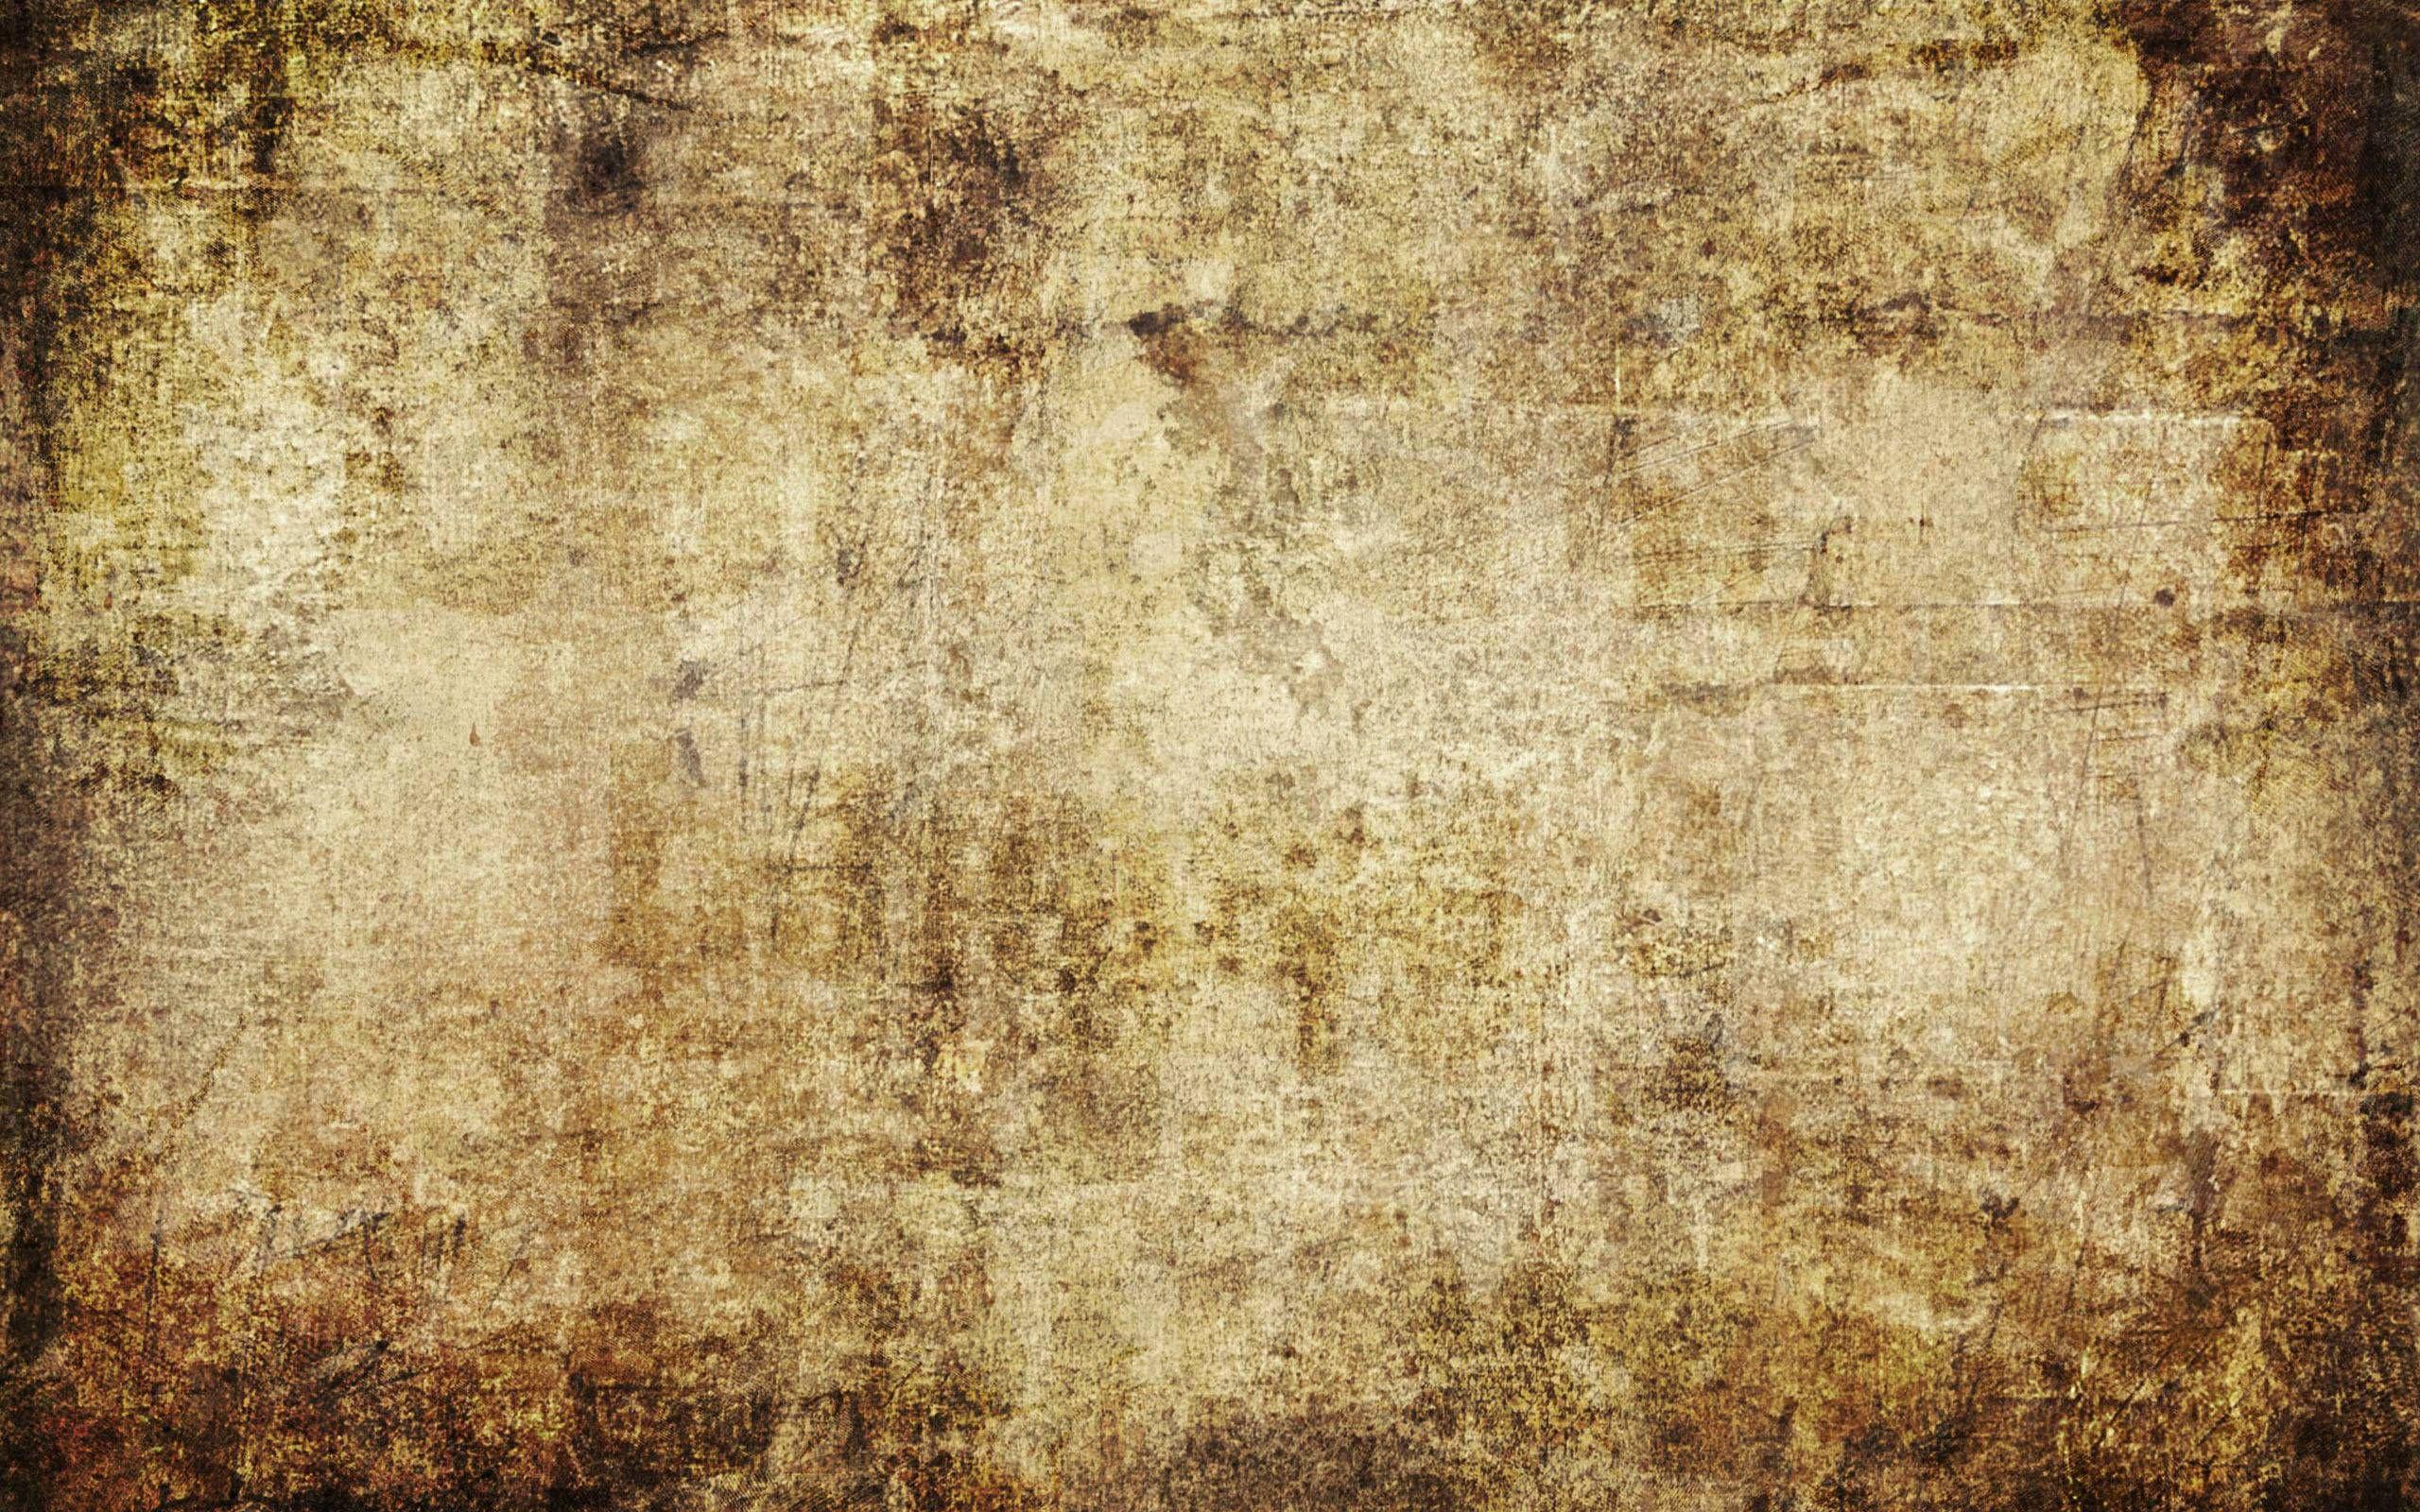 Textured Wallpaper Backgrounds Grunge Textures Textured Wallpaper Texture Background Hd